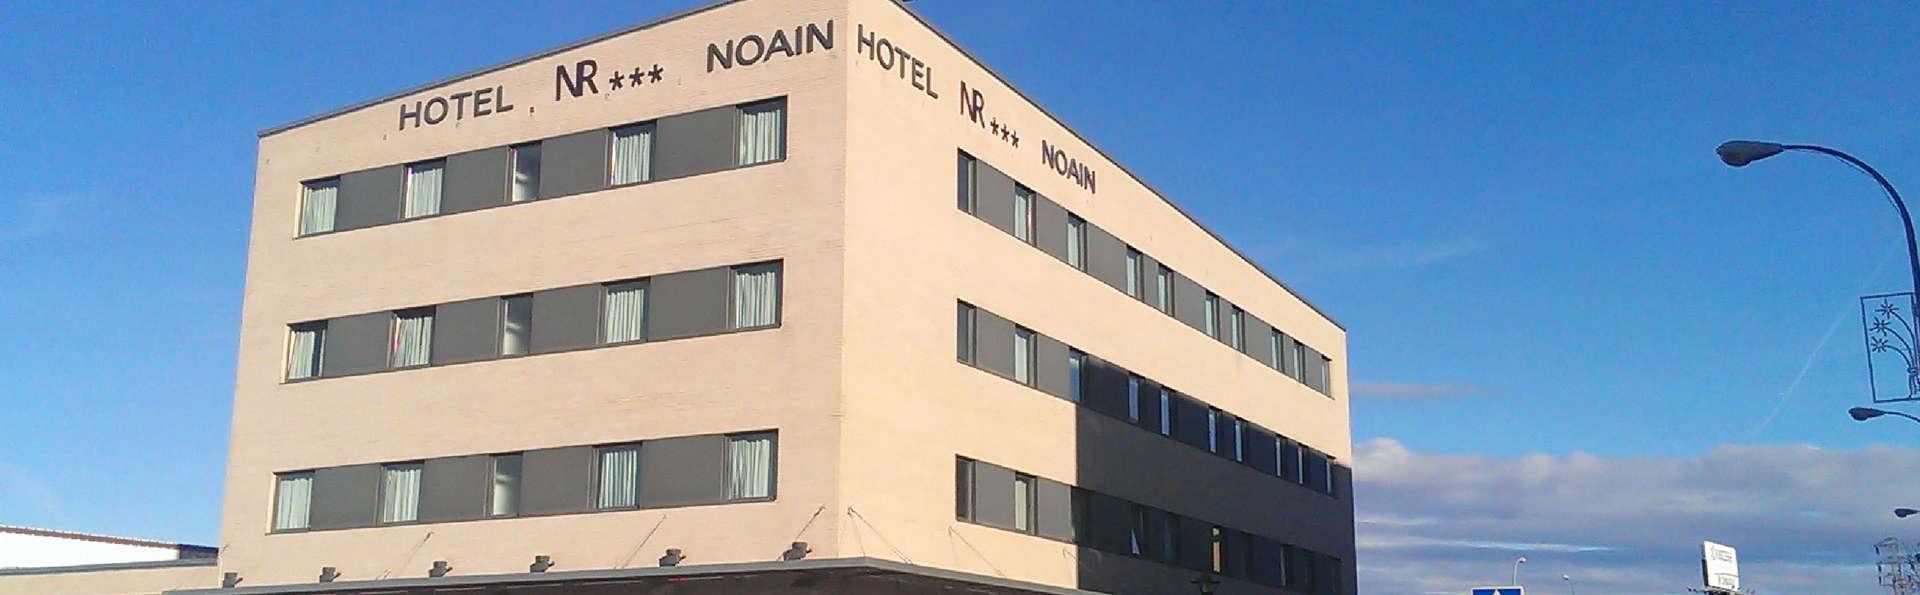 Hotel Ibis Styles Pamplona Noain - edit_front3.jpg